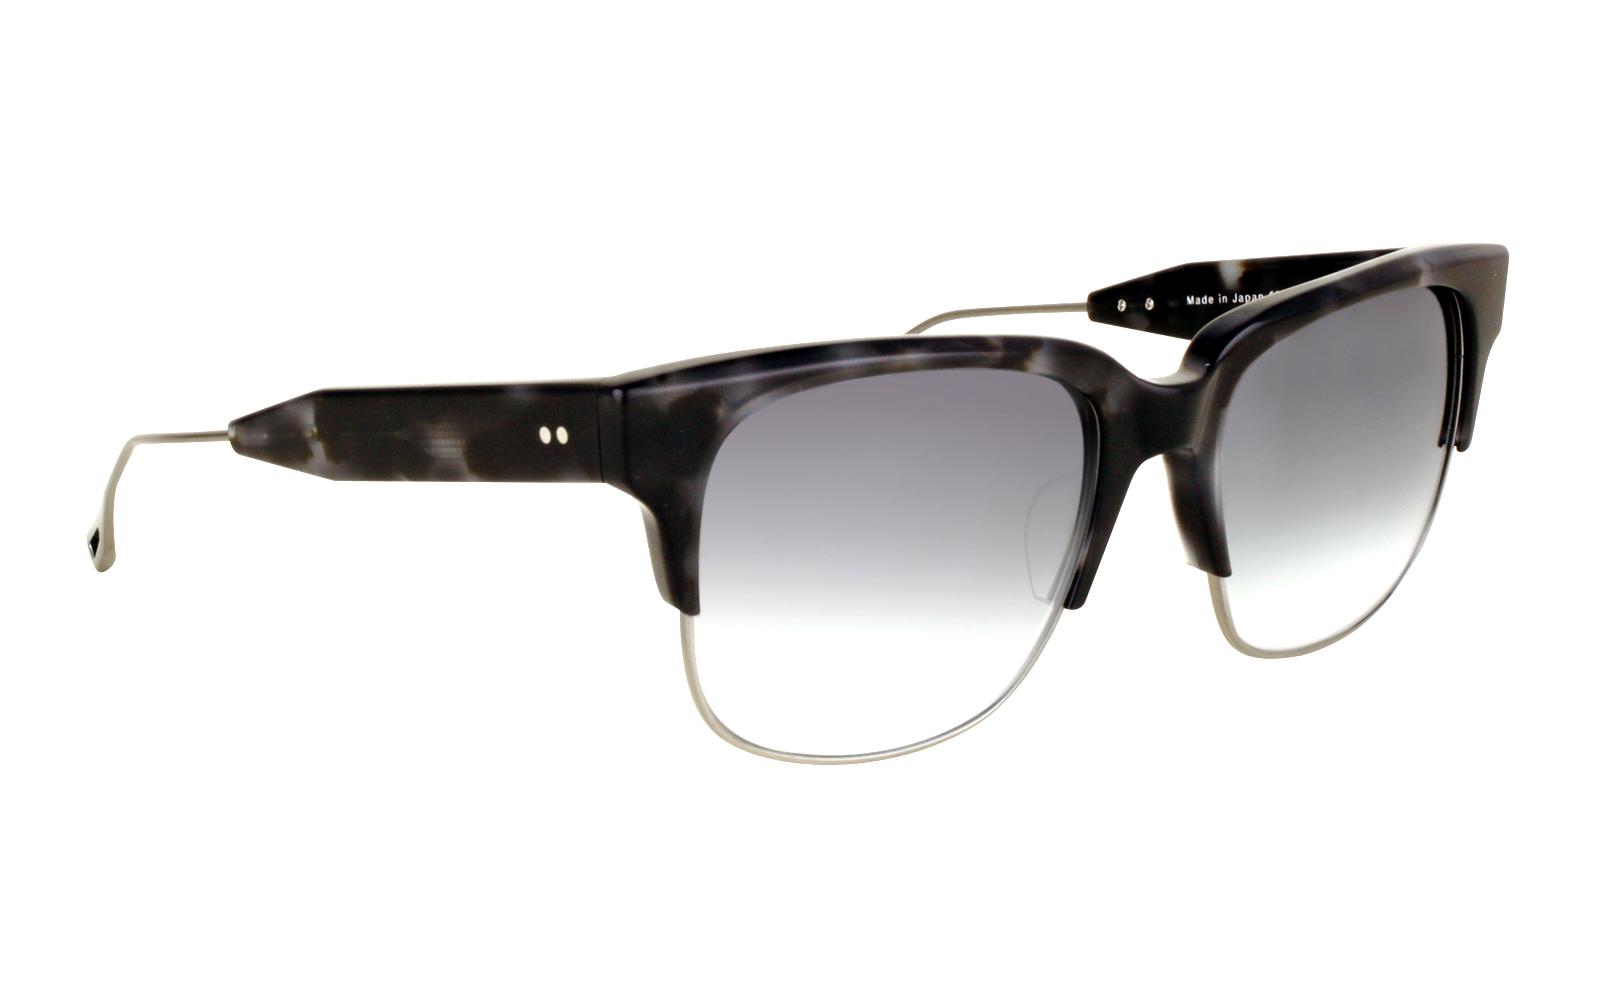 15aac8593ff1 Dita Traveller C Sunglasses